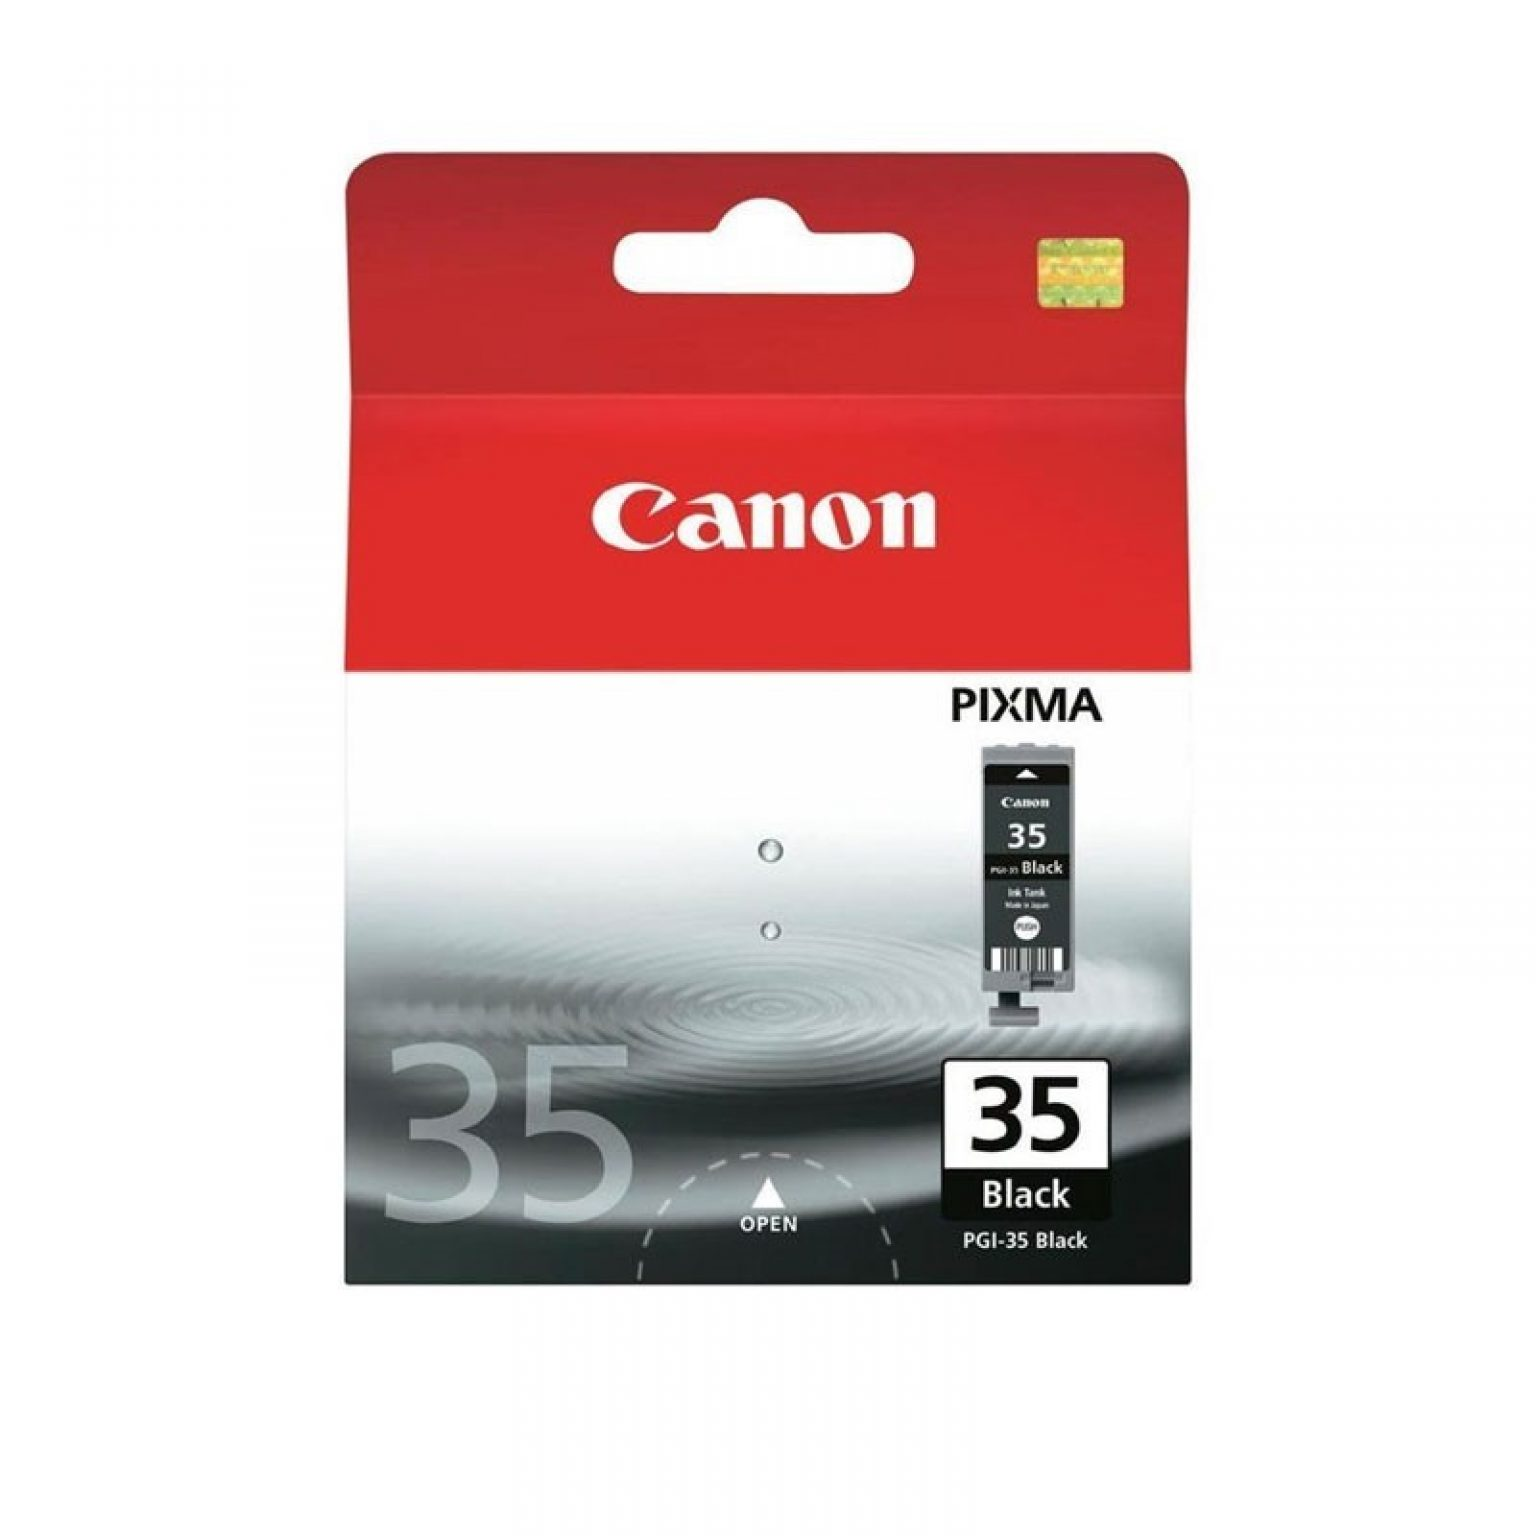 CANON - Ink Cartridge PGI-35 Black [PGI-35BK]